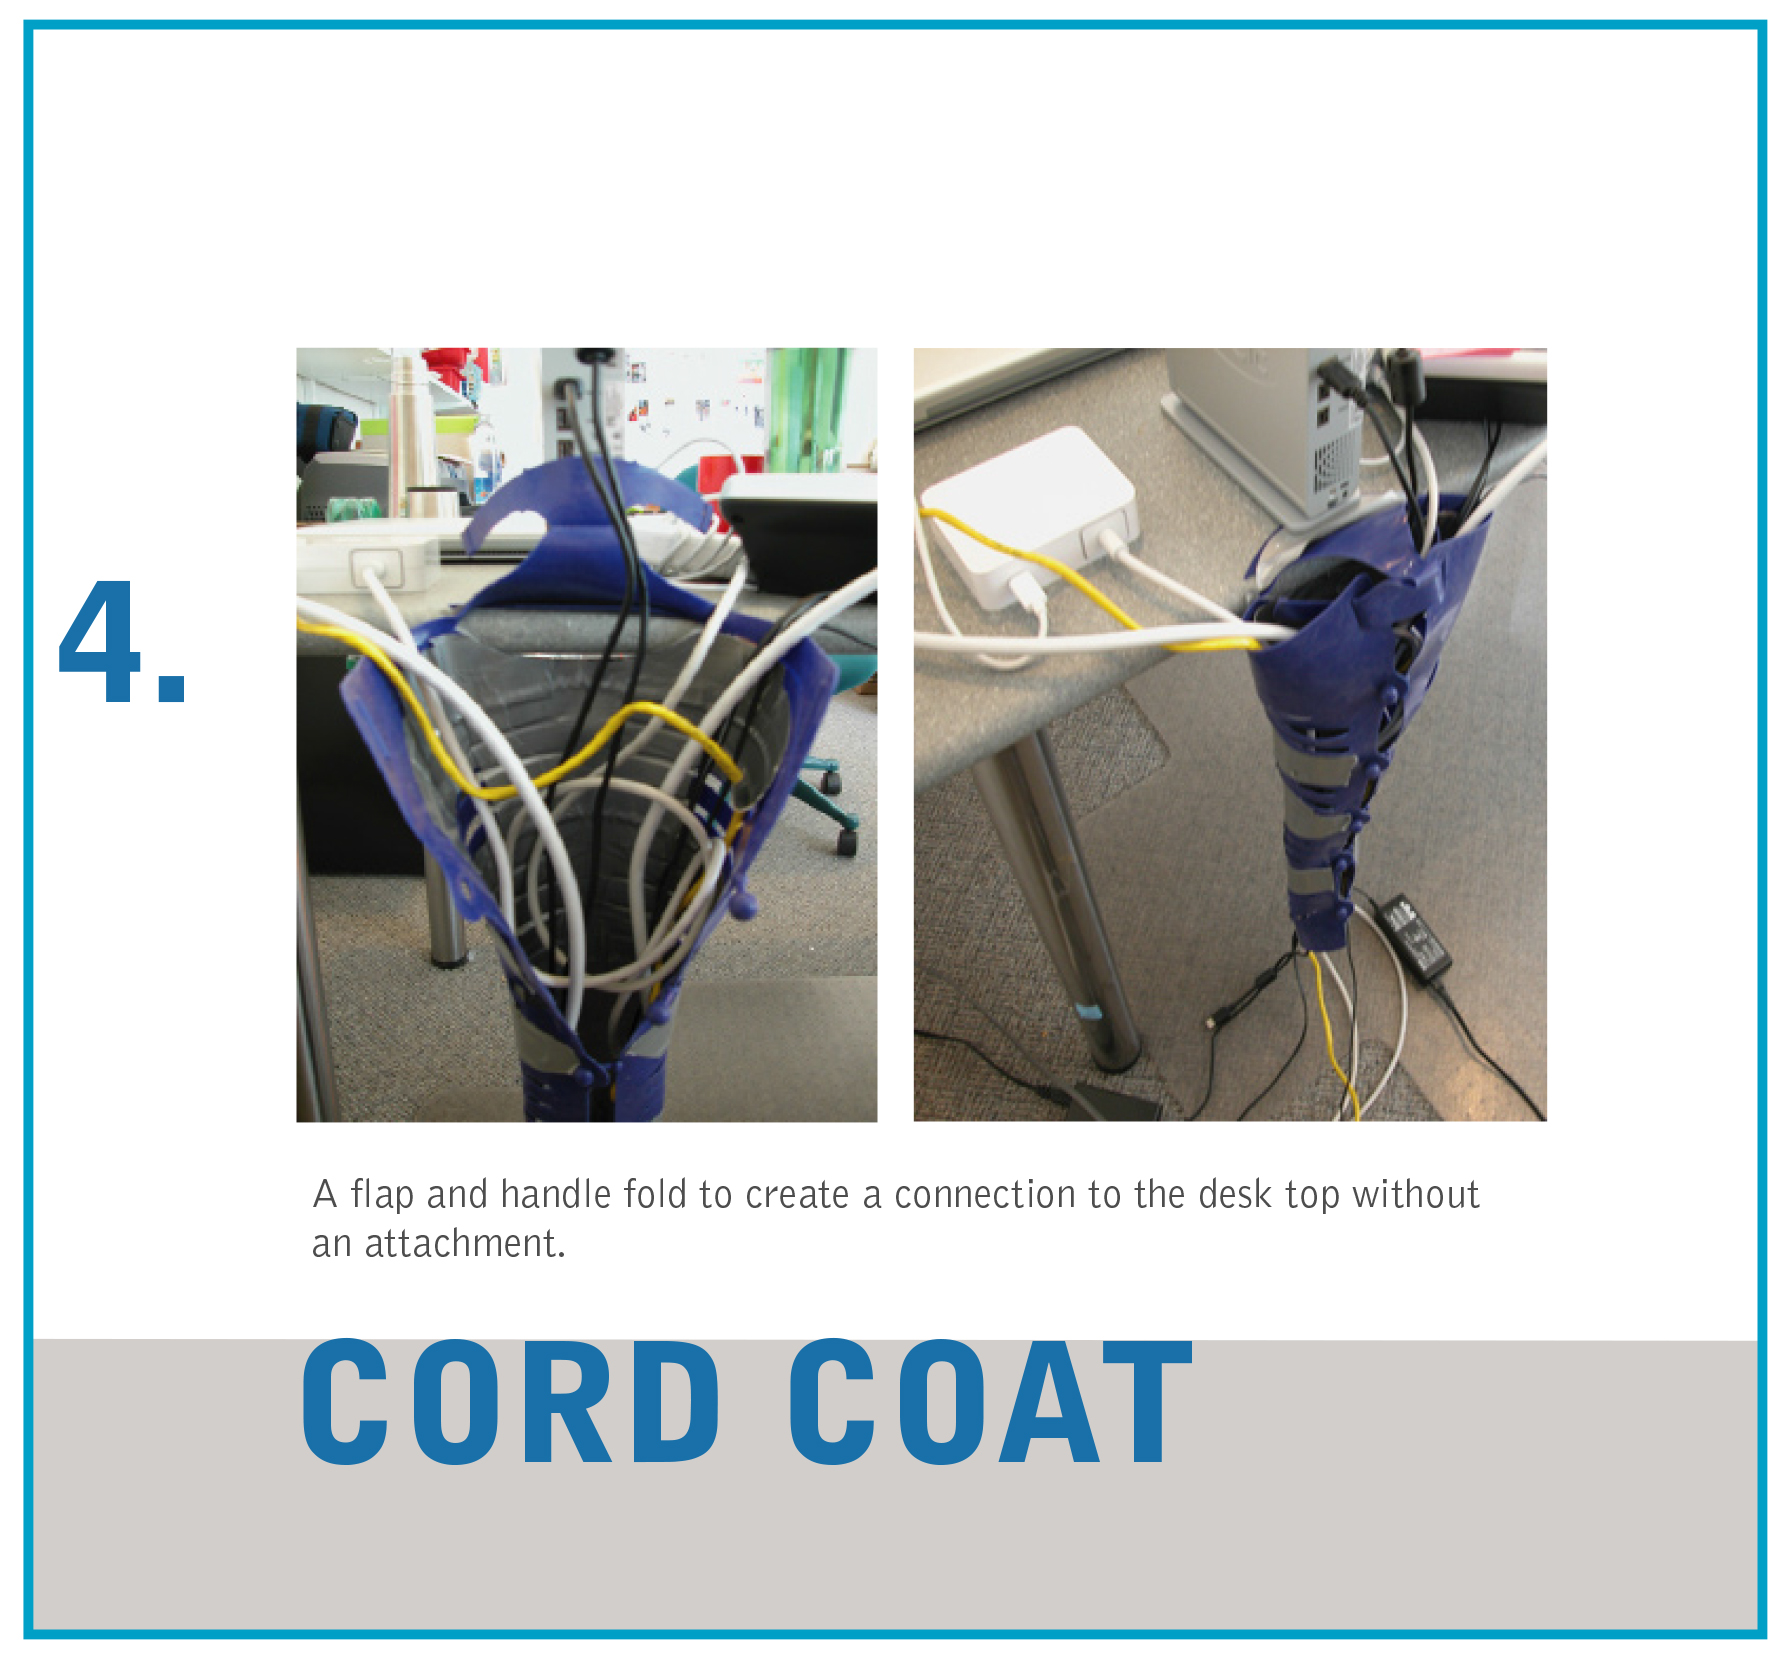 cord coat 4.jpg